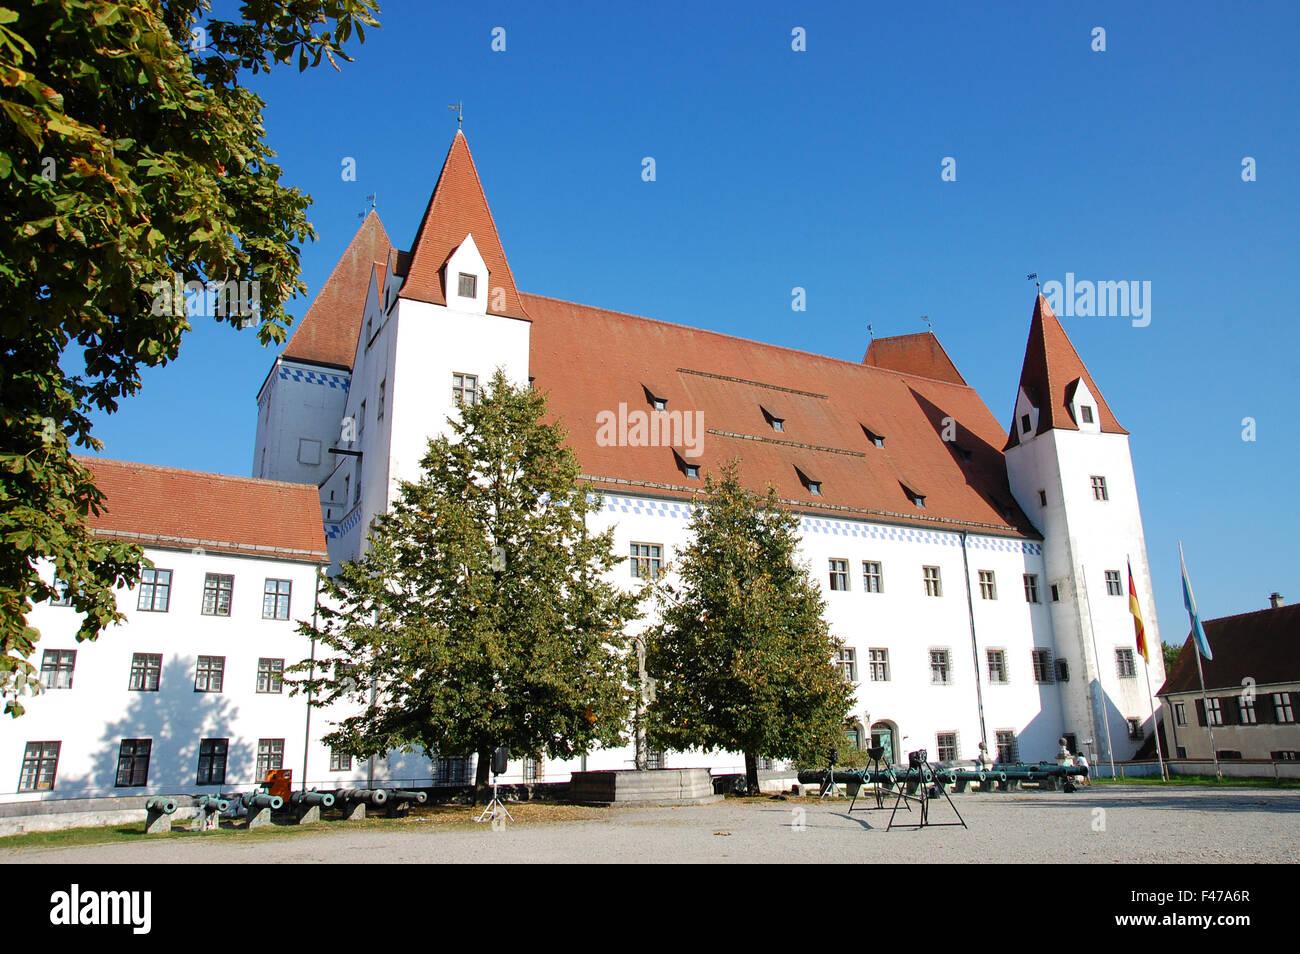 Neues Schloss in Ingolstadt, Germany Stock Photo